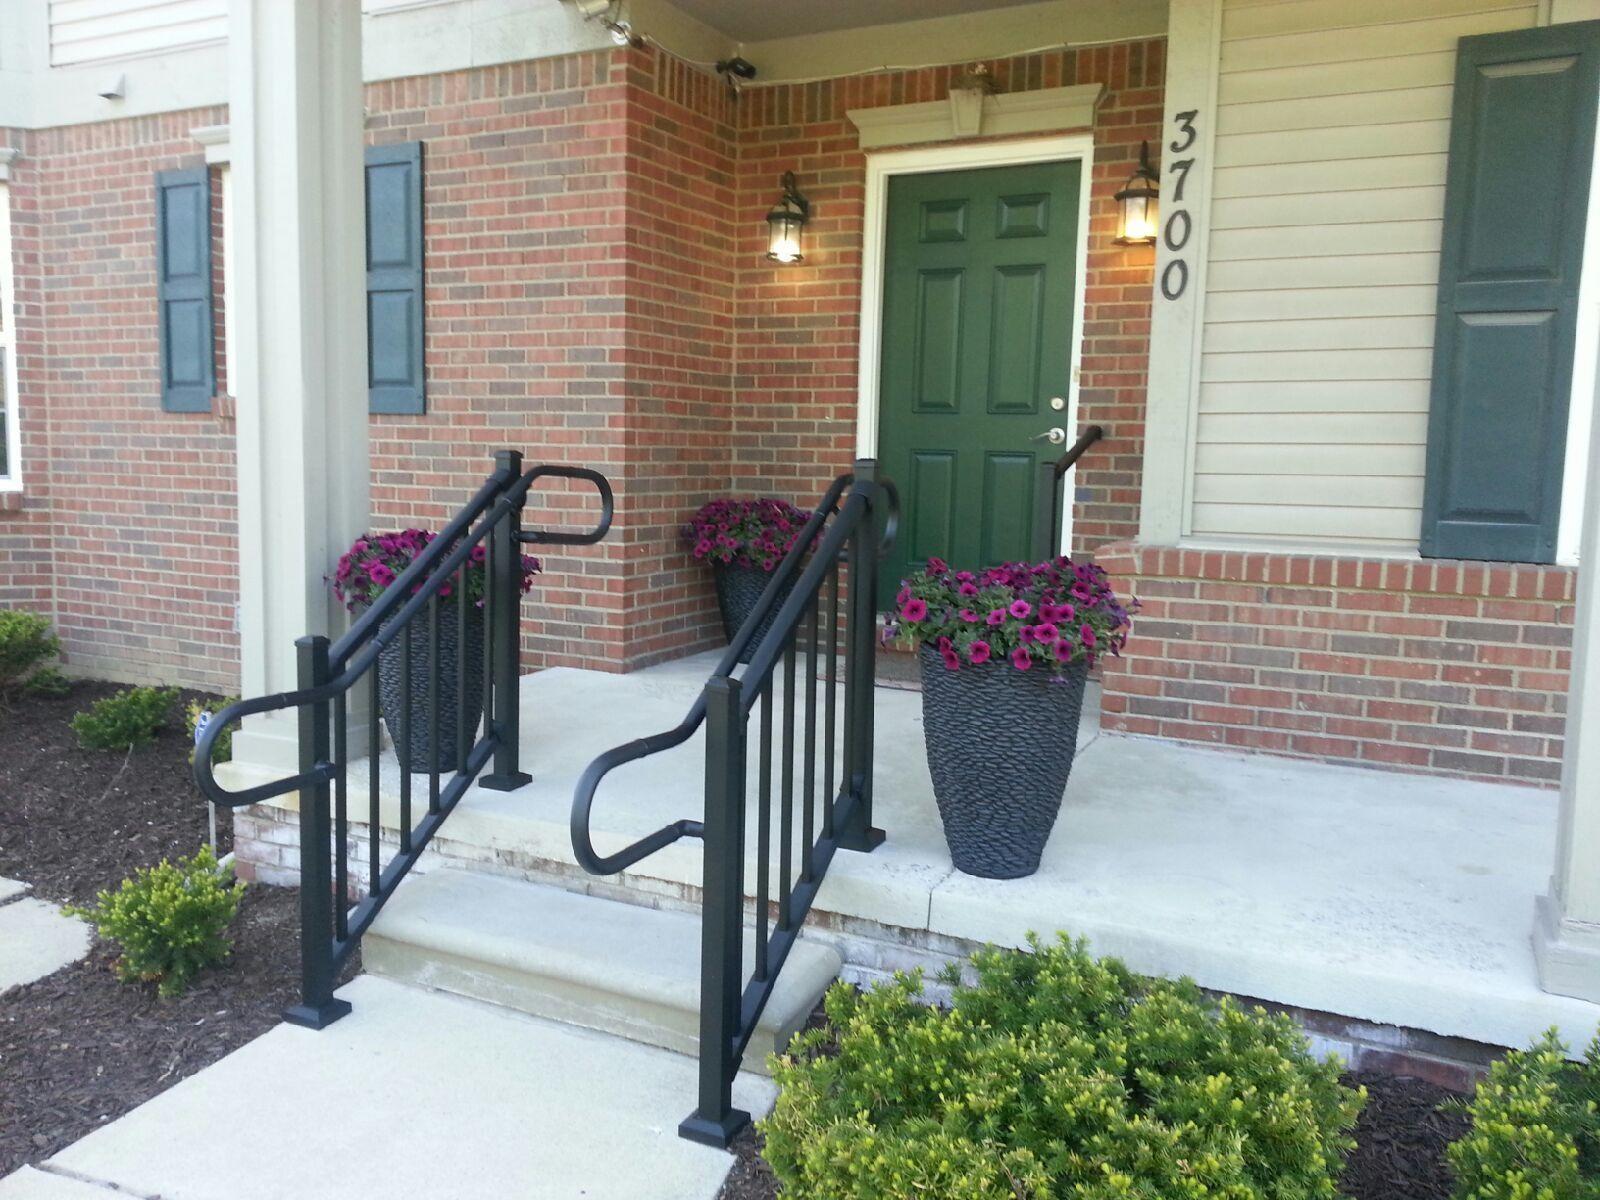 The Proper Handrail Height Aluminum Handrail Direct | Outdoor Handrails Near Me | Handrail Ideas | Metal | Wrought Iron Railings | Stair Railings | Steel Handrail